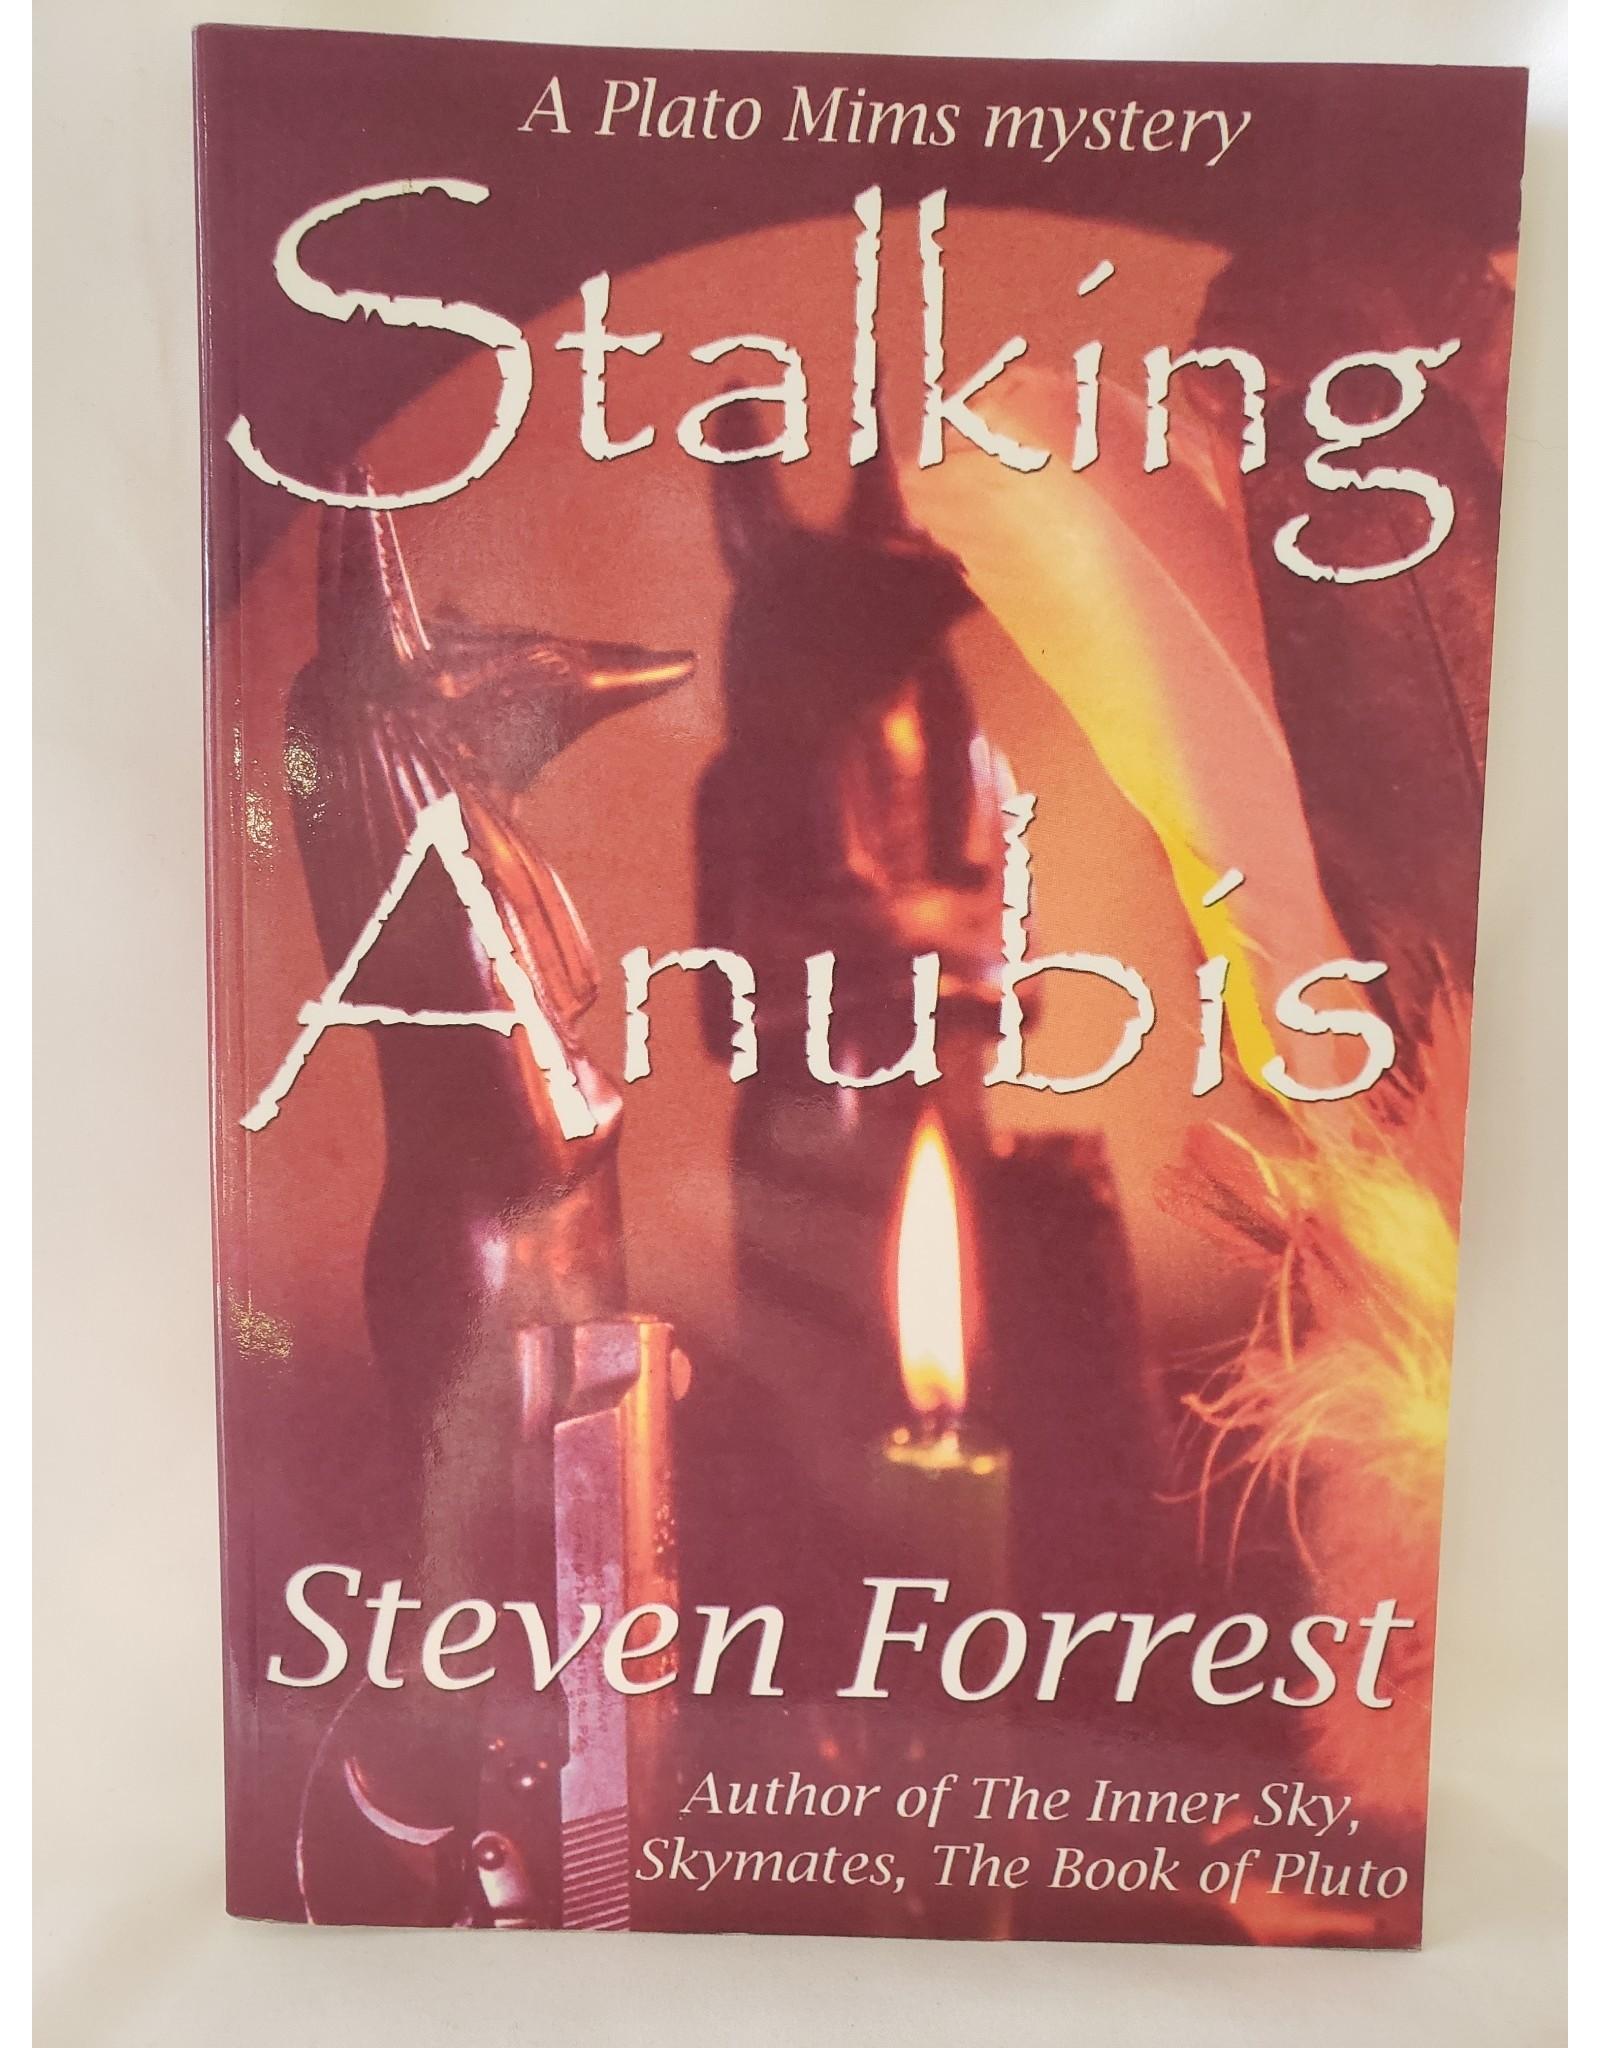 Stalking Anubis by Steven Forrest